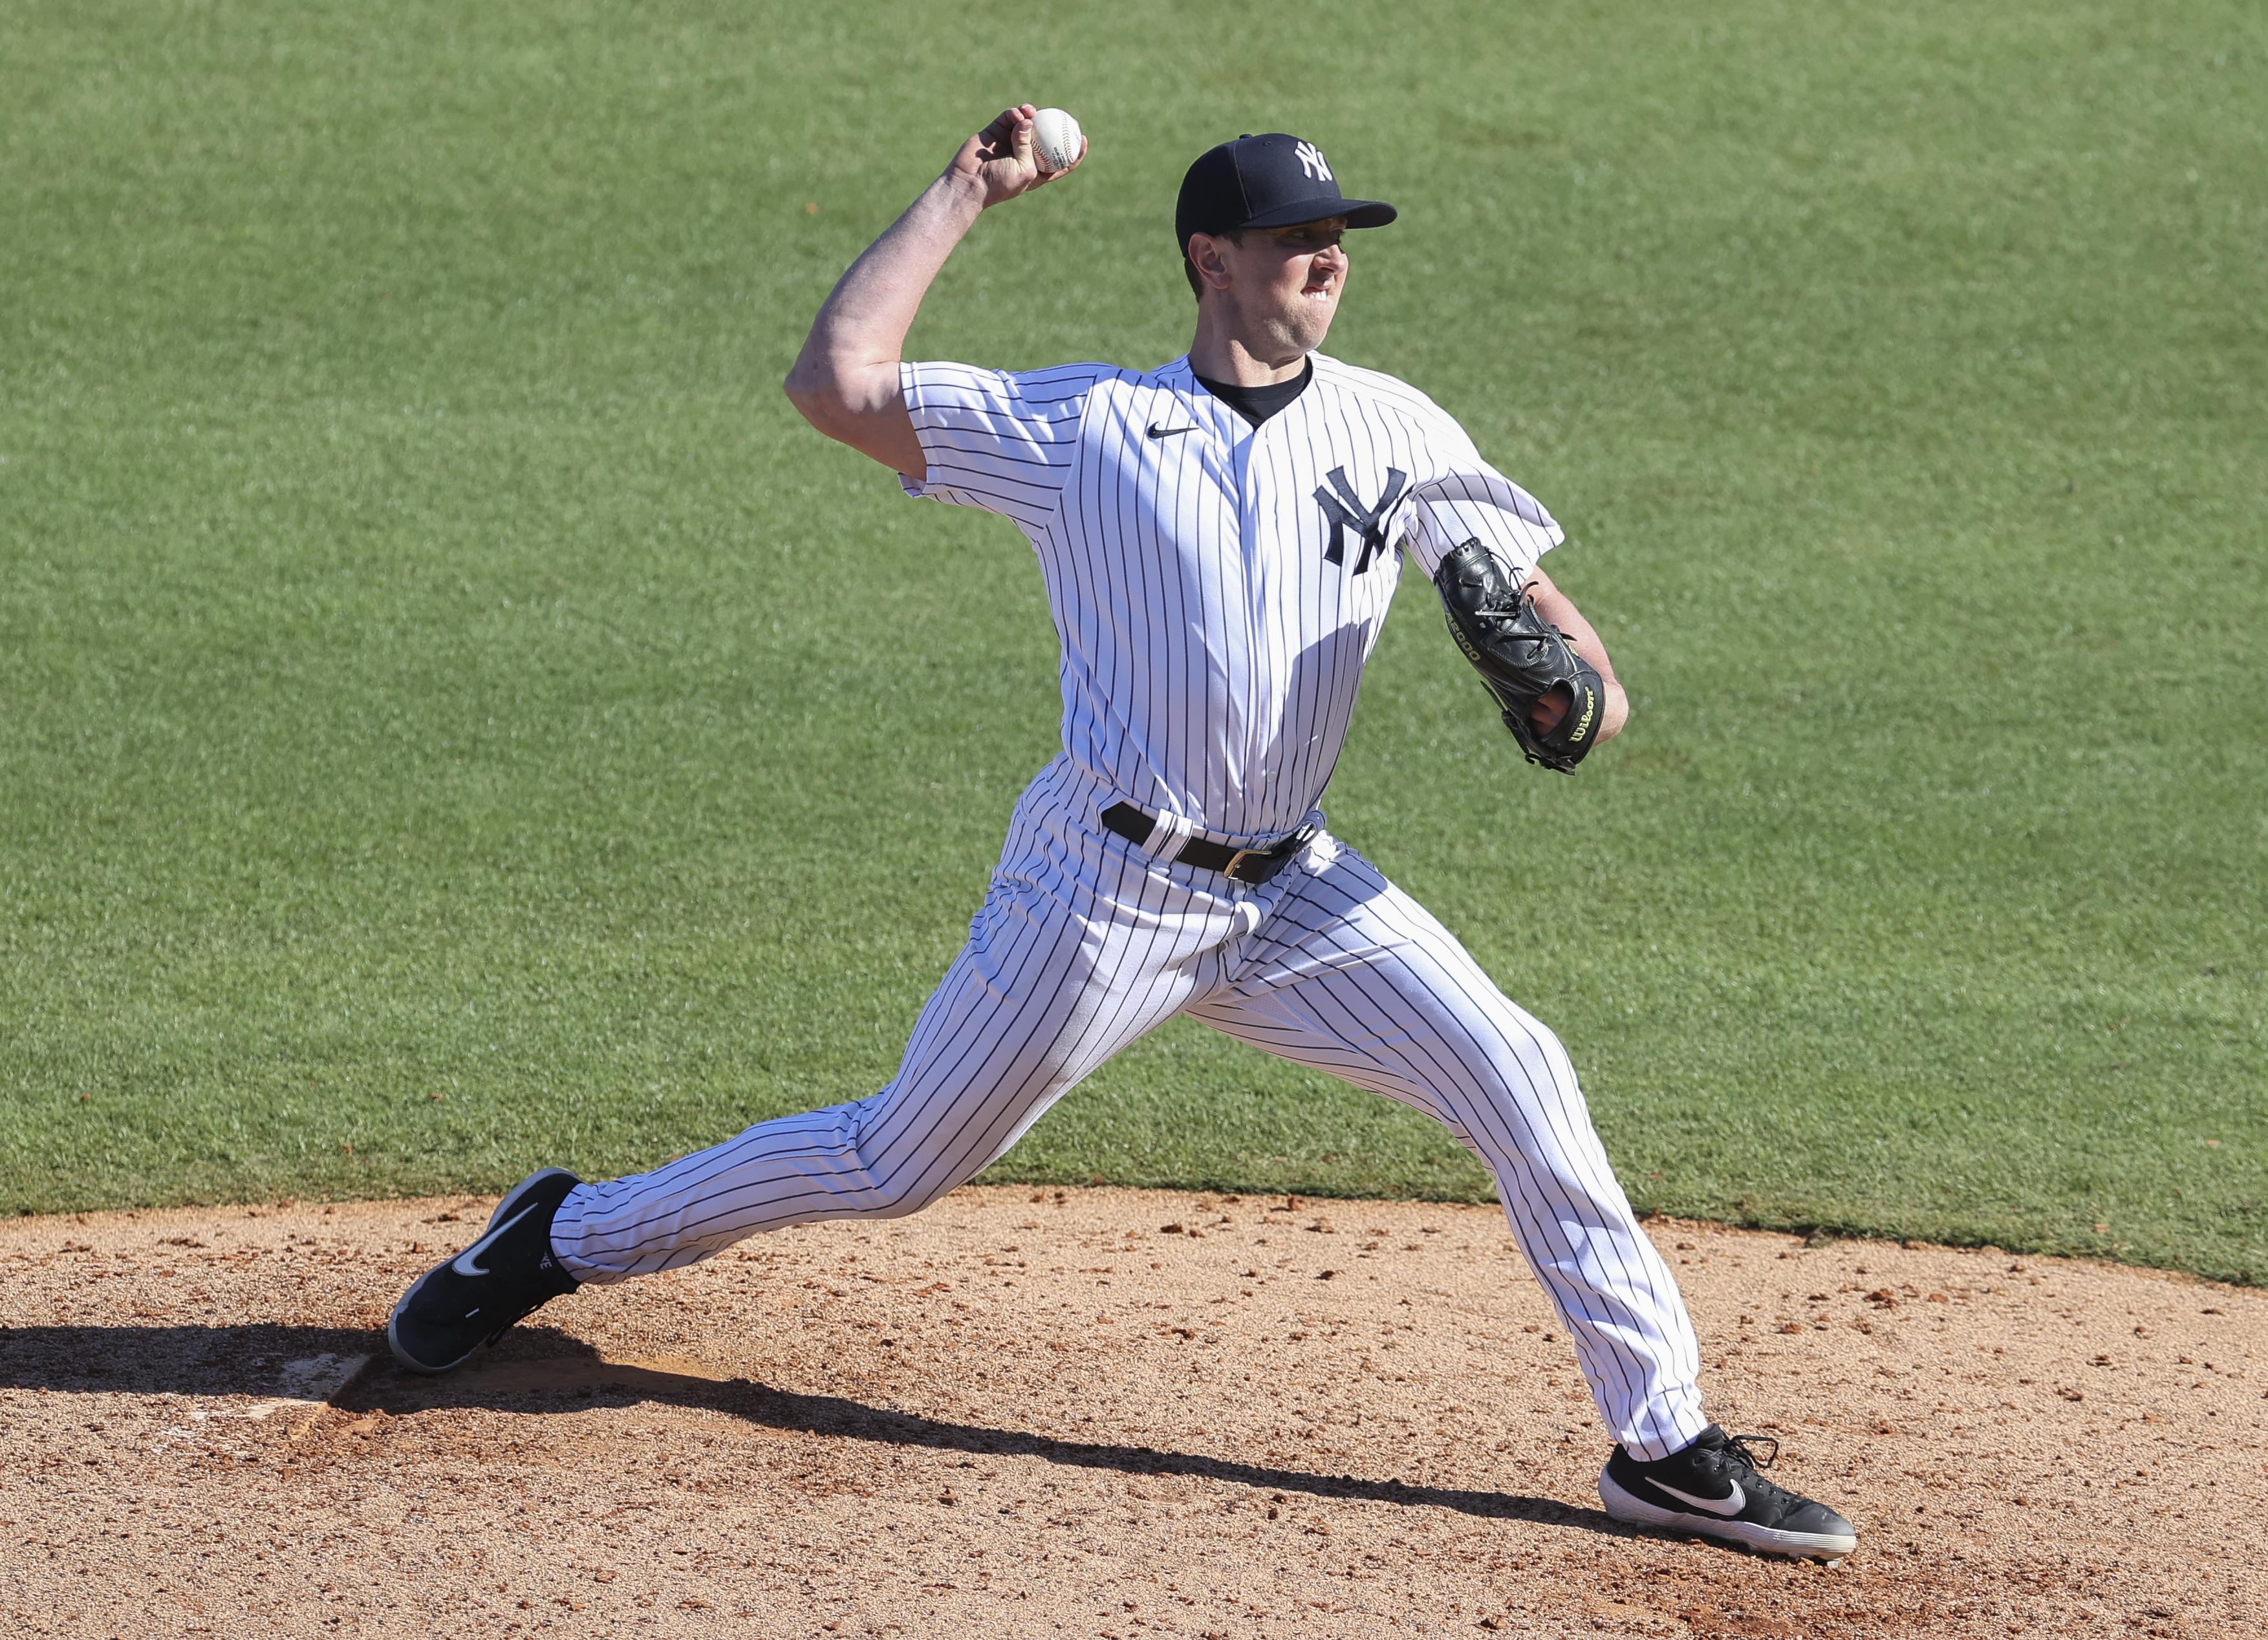 MLB: MAR 07 Spring Training - Phillies at Yankees